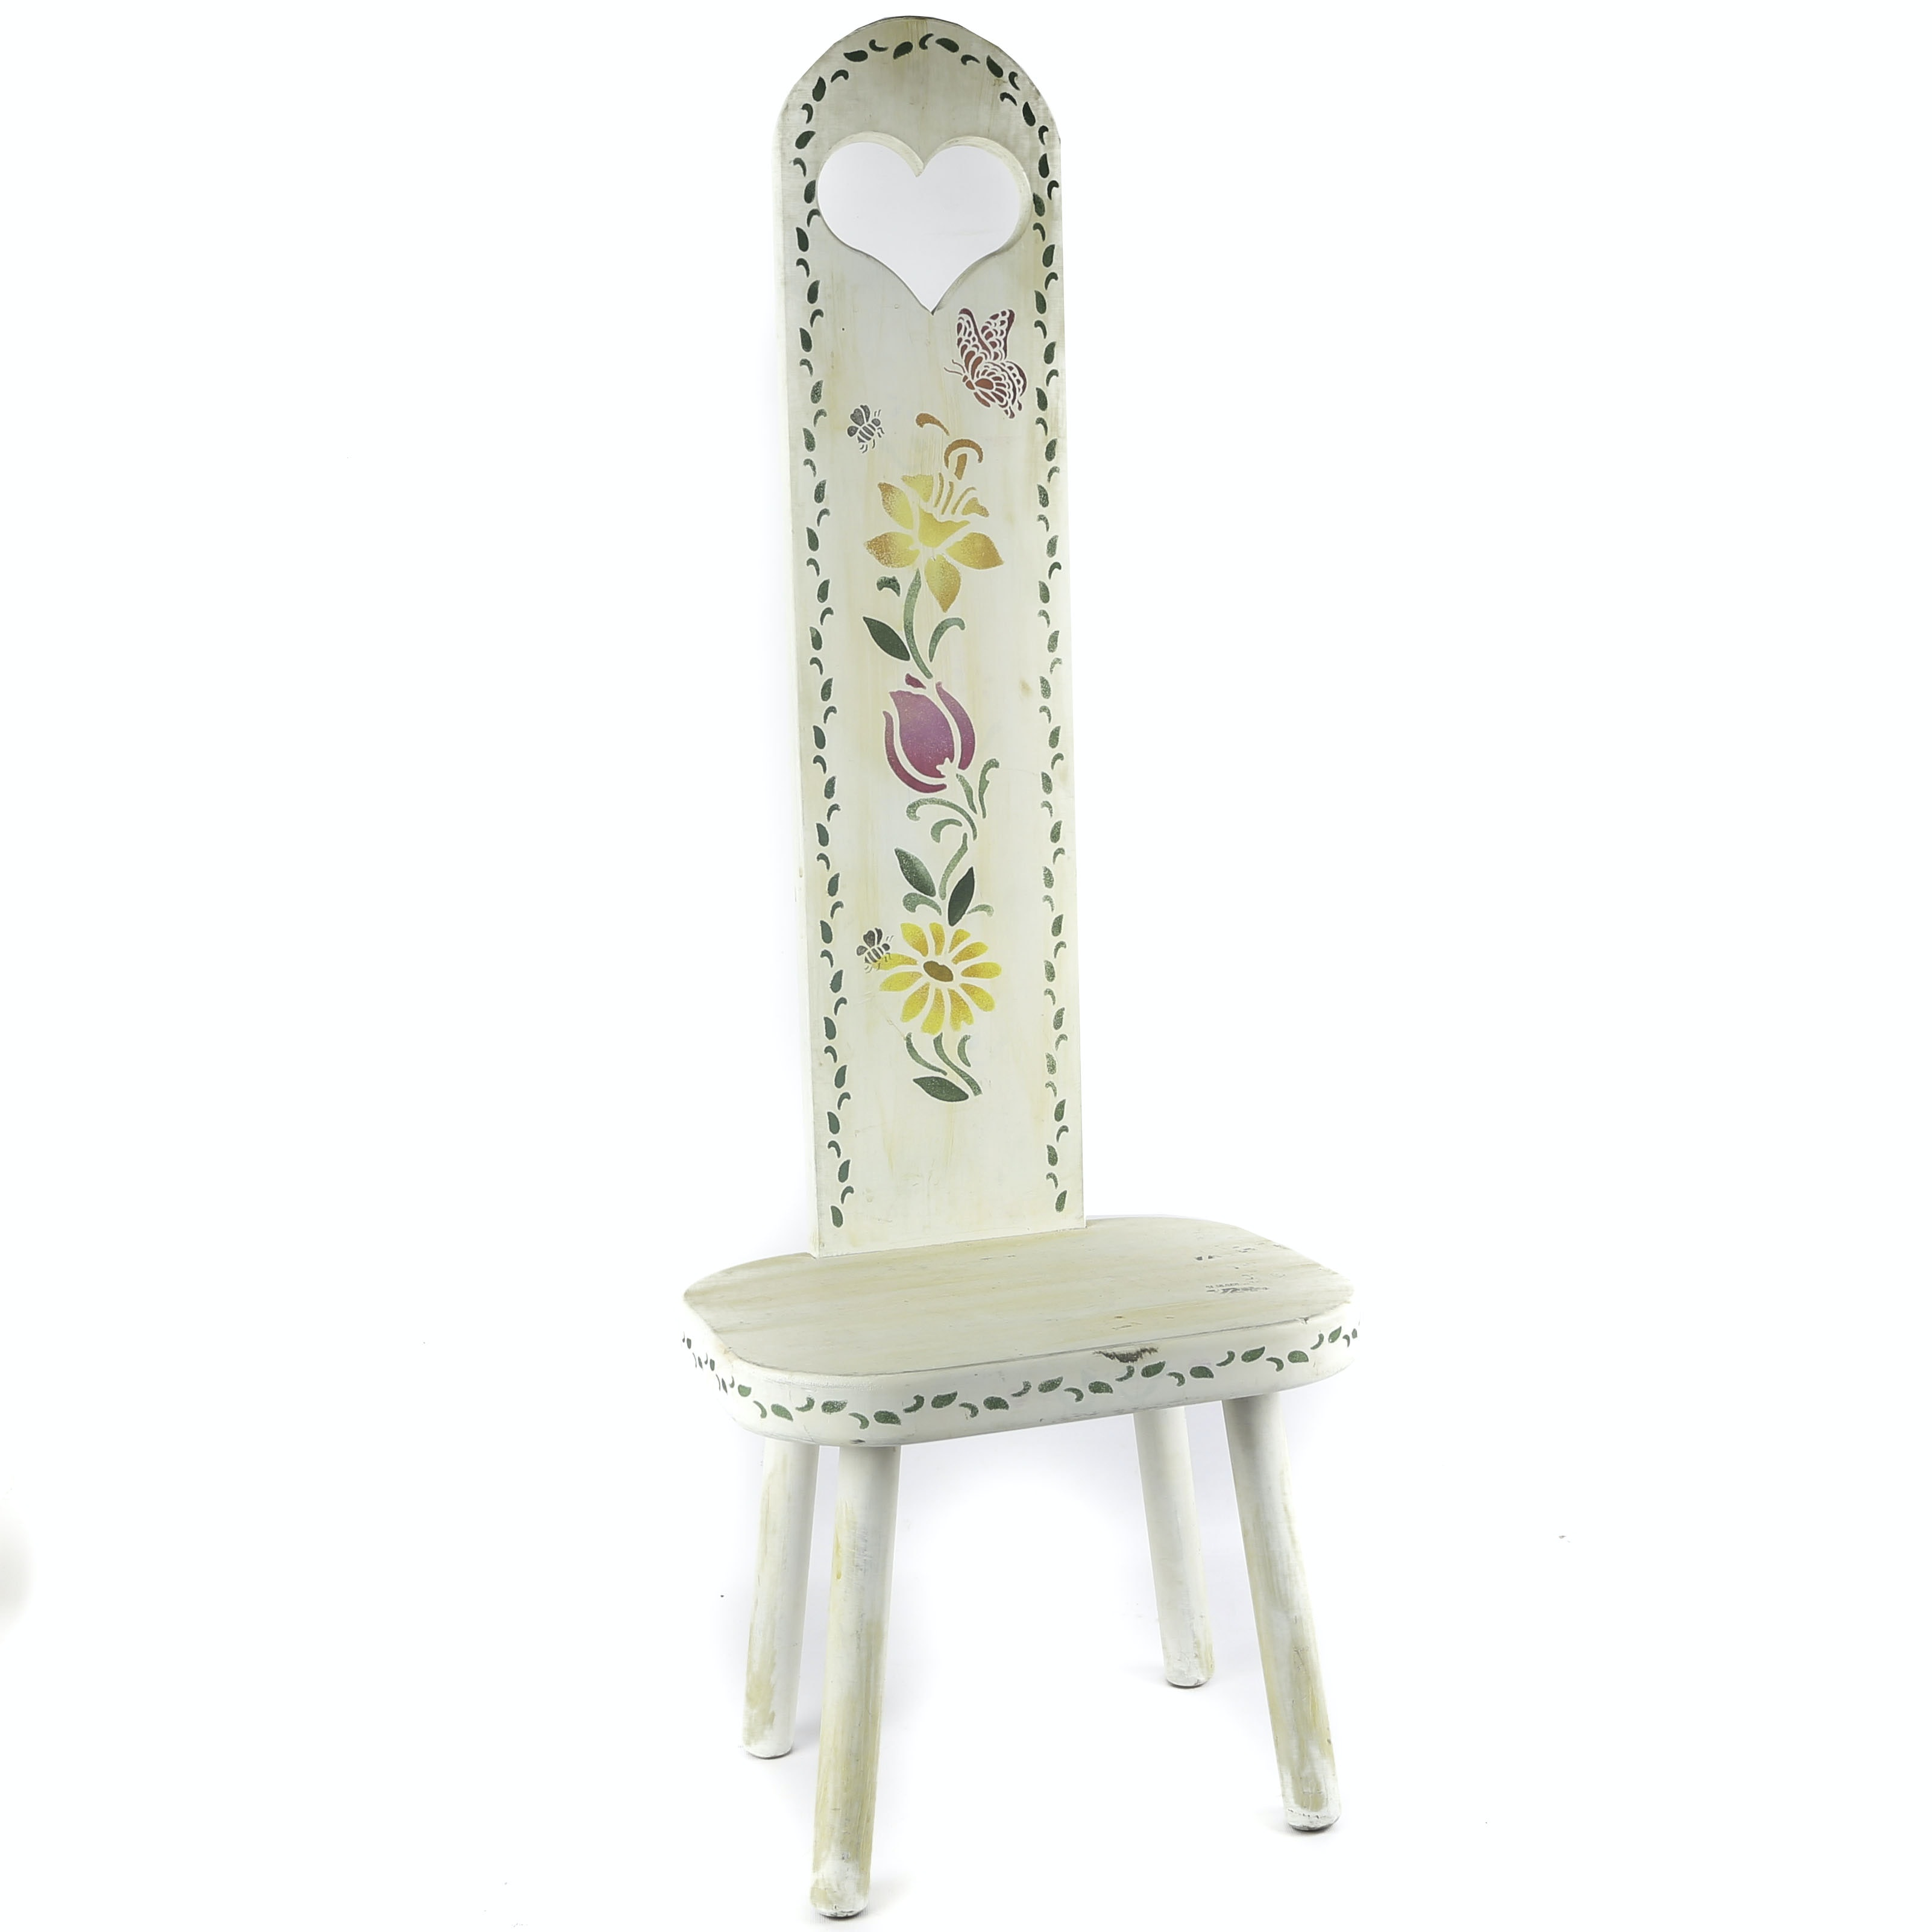 European Folk Style Painted Wooden Hall Chair, 20th Century